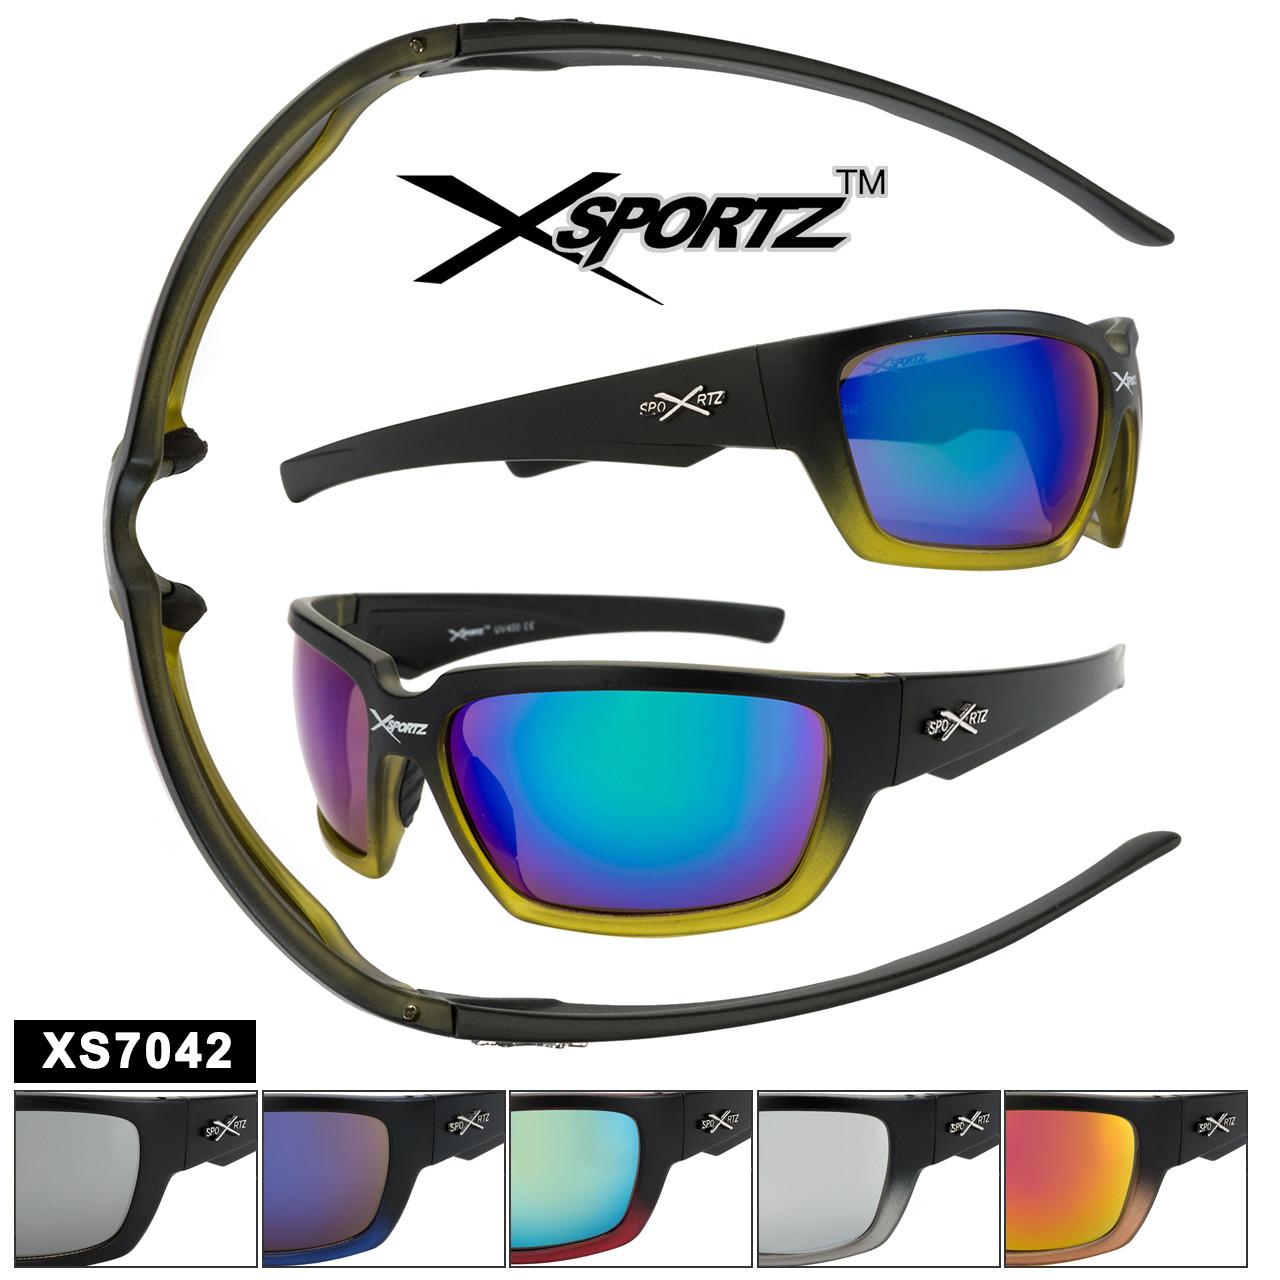 Men/'s Sports Sunglasses Xsportz XS12 Black Frame Mirror lens 100/% UV Protection